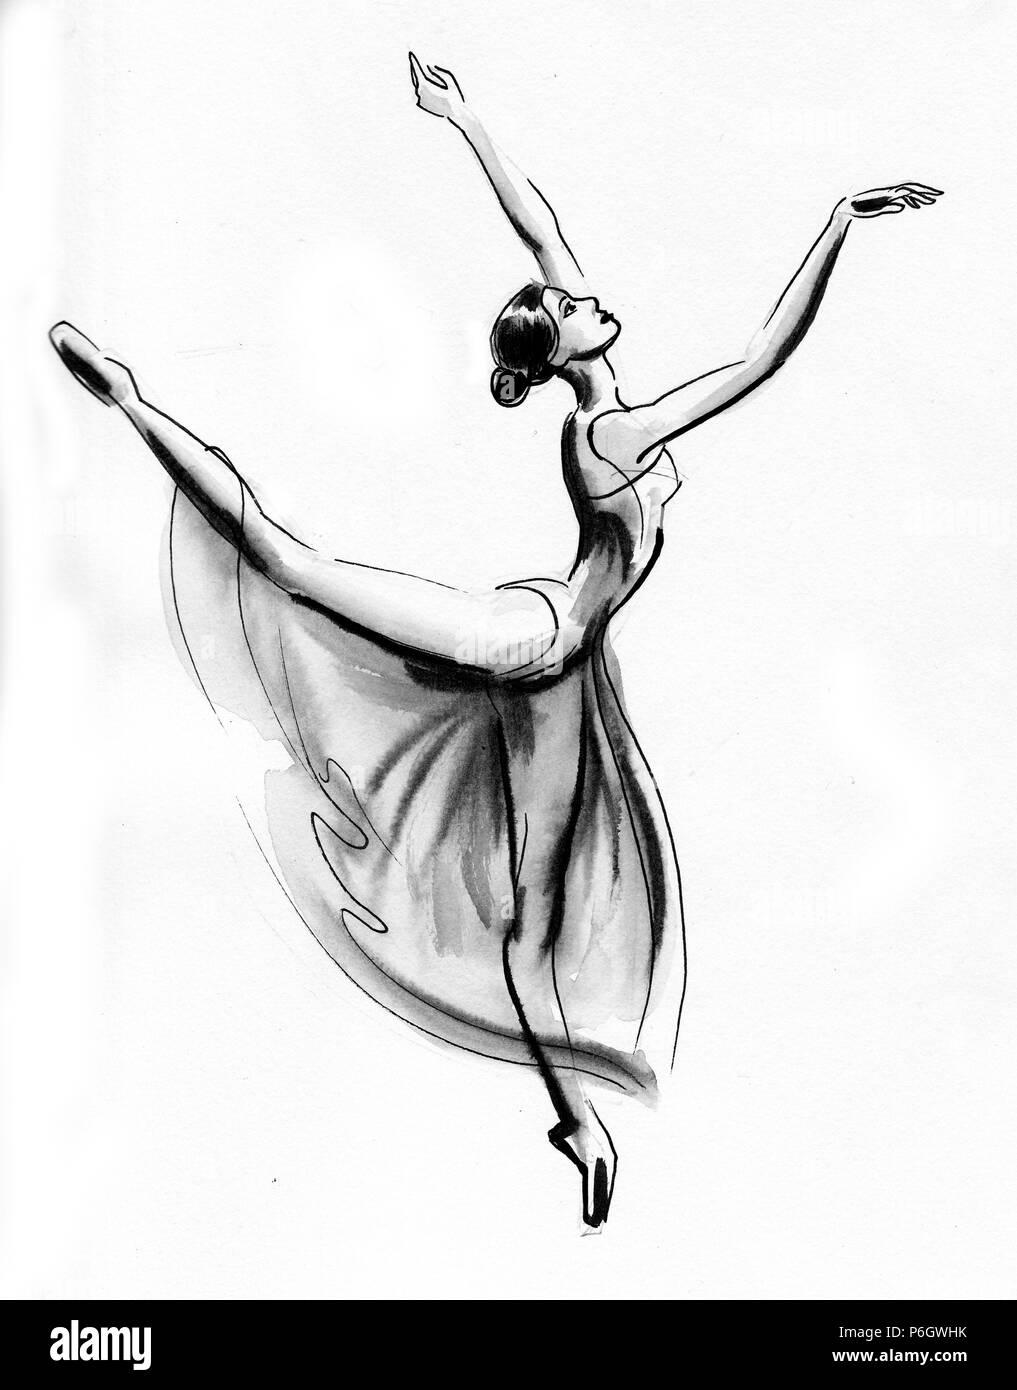 Dancing Ballerina Ink Black And White Illustration Stock Photo Alamy